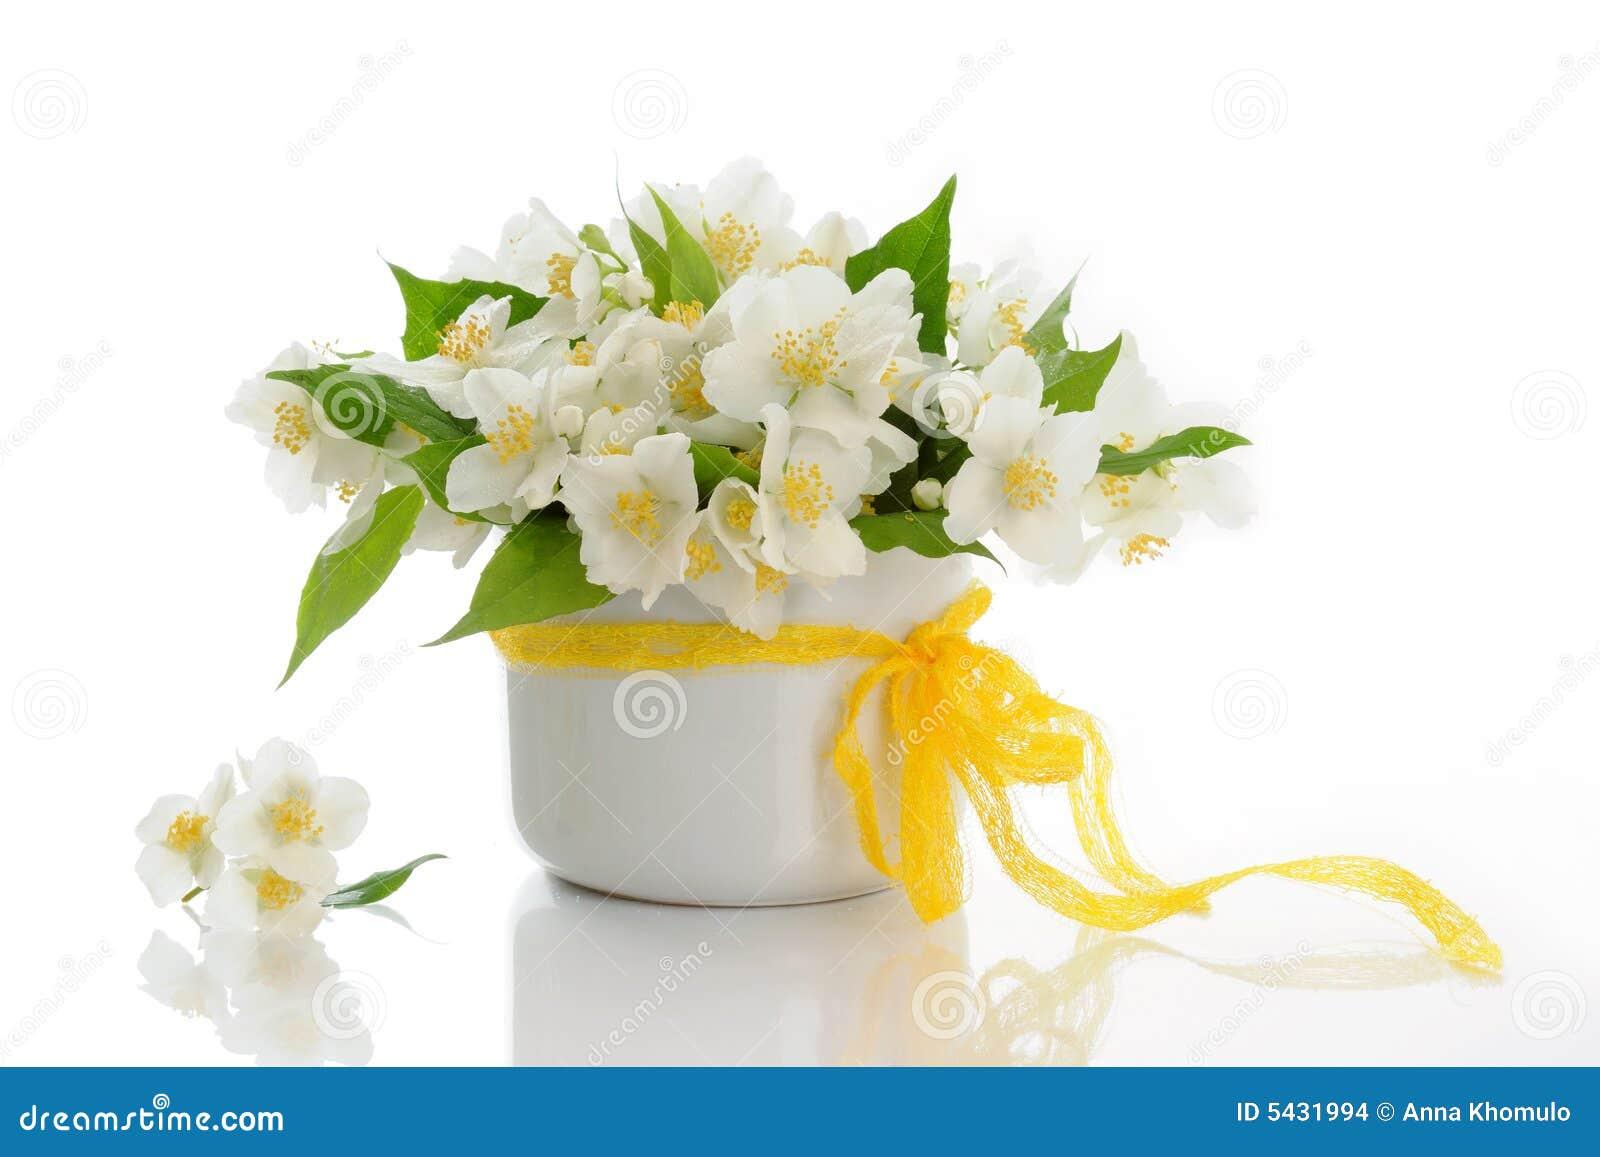 Bunch of jasmine flowers stock image image of isolated 14462017 jasmine flowers stock images izmirmasajfo